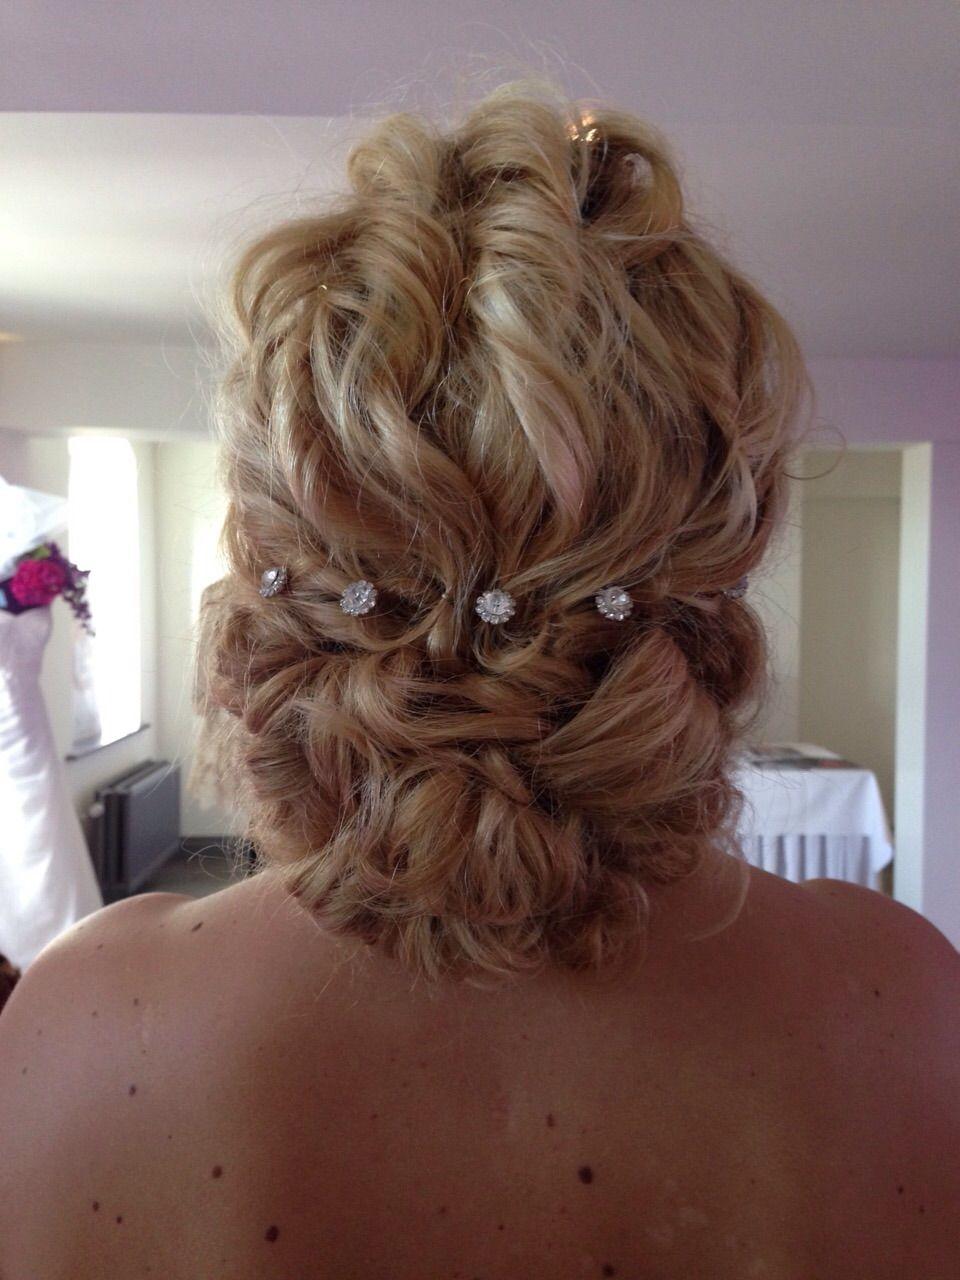 Pin by amatullah mithaiwala on wedding hairstyles pinterest prom